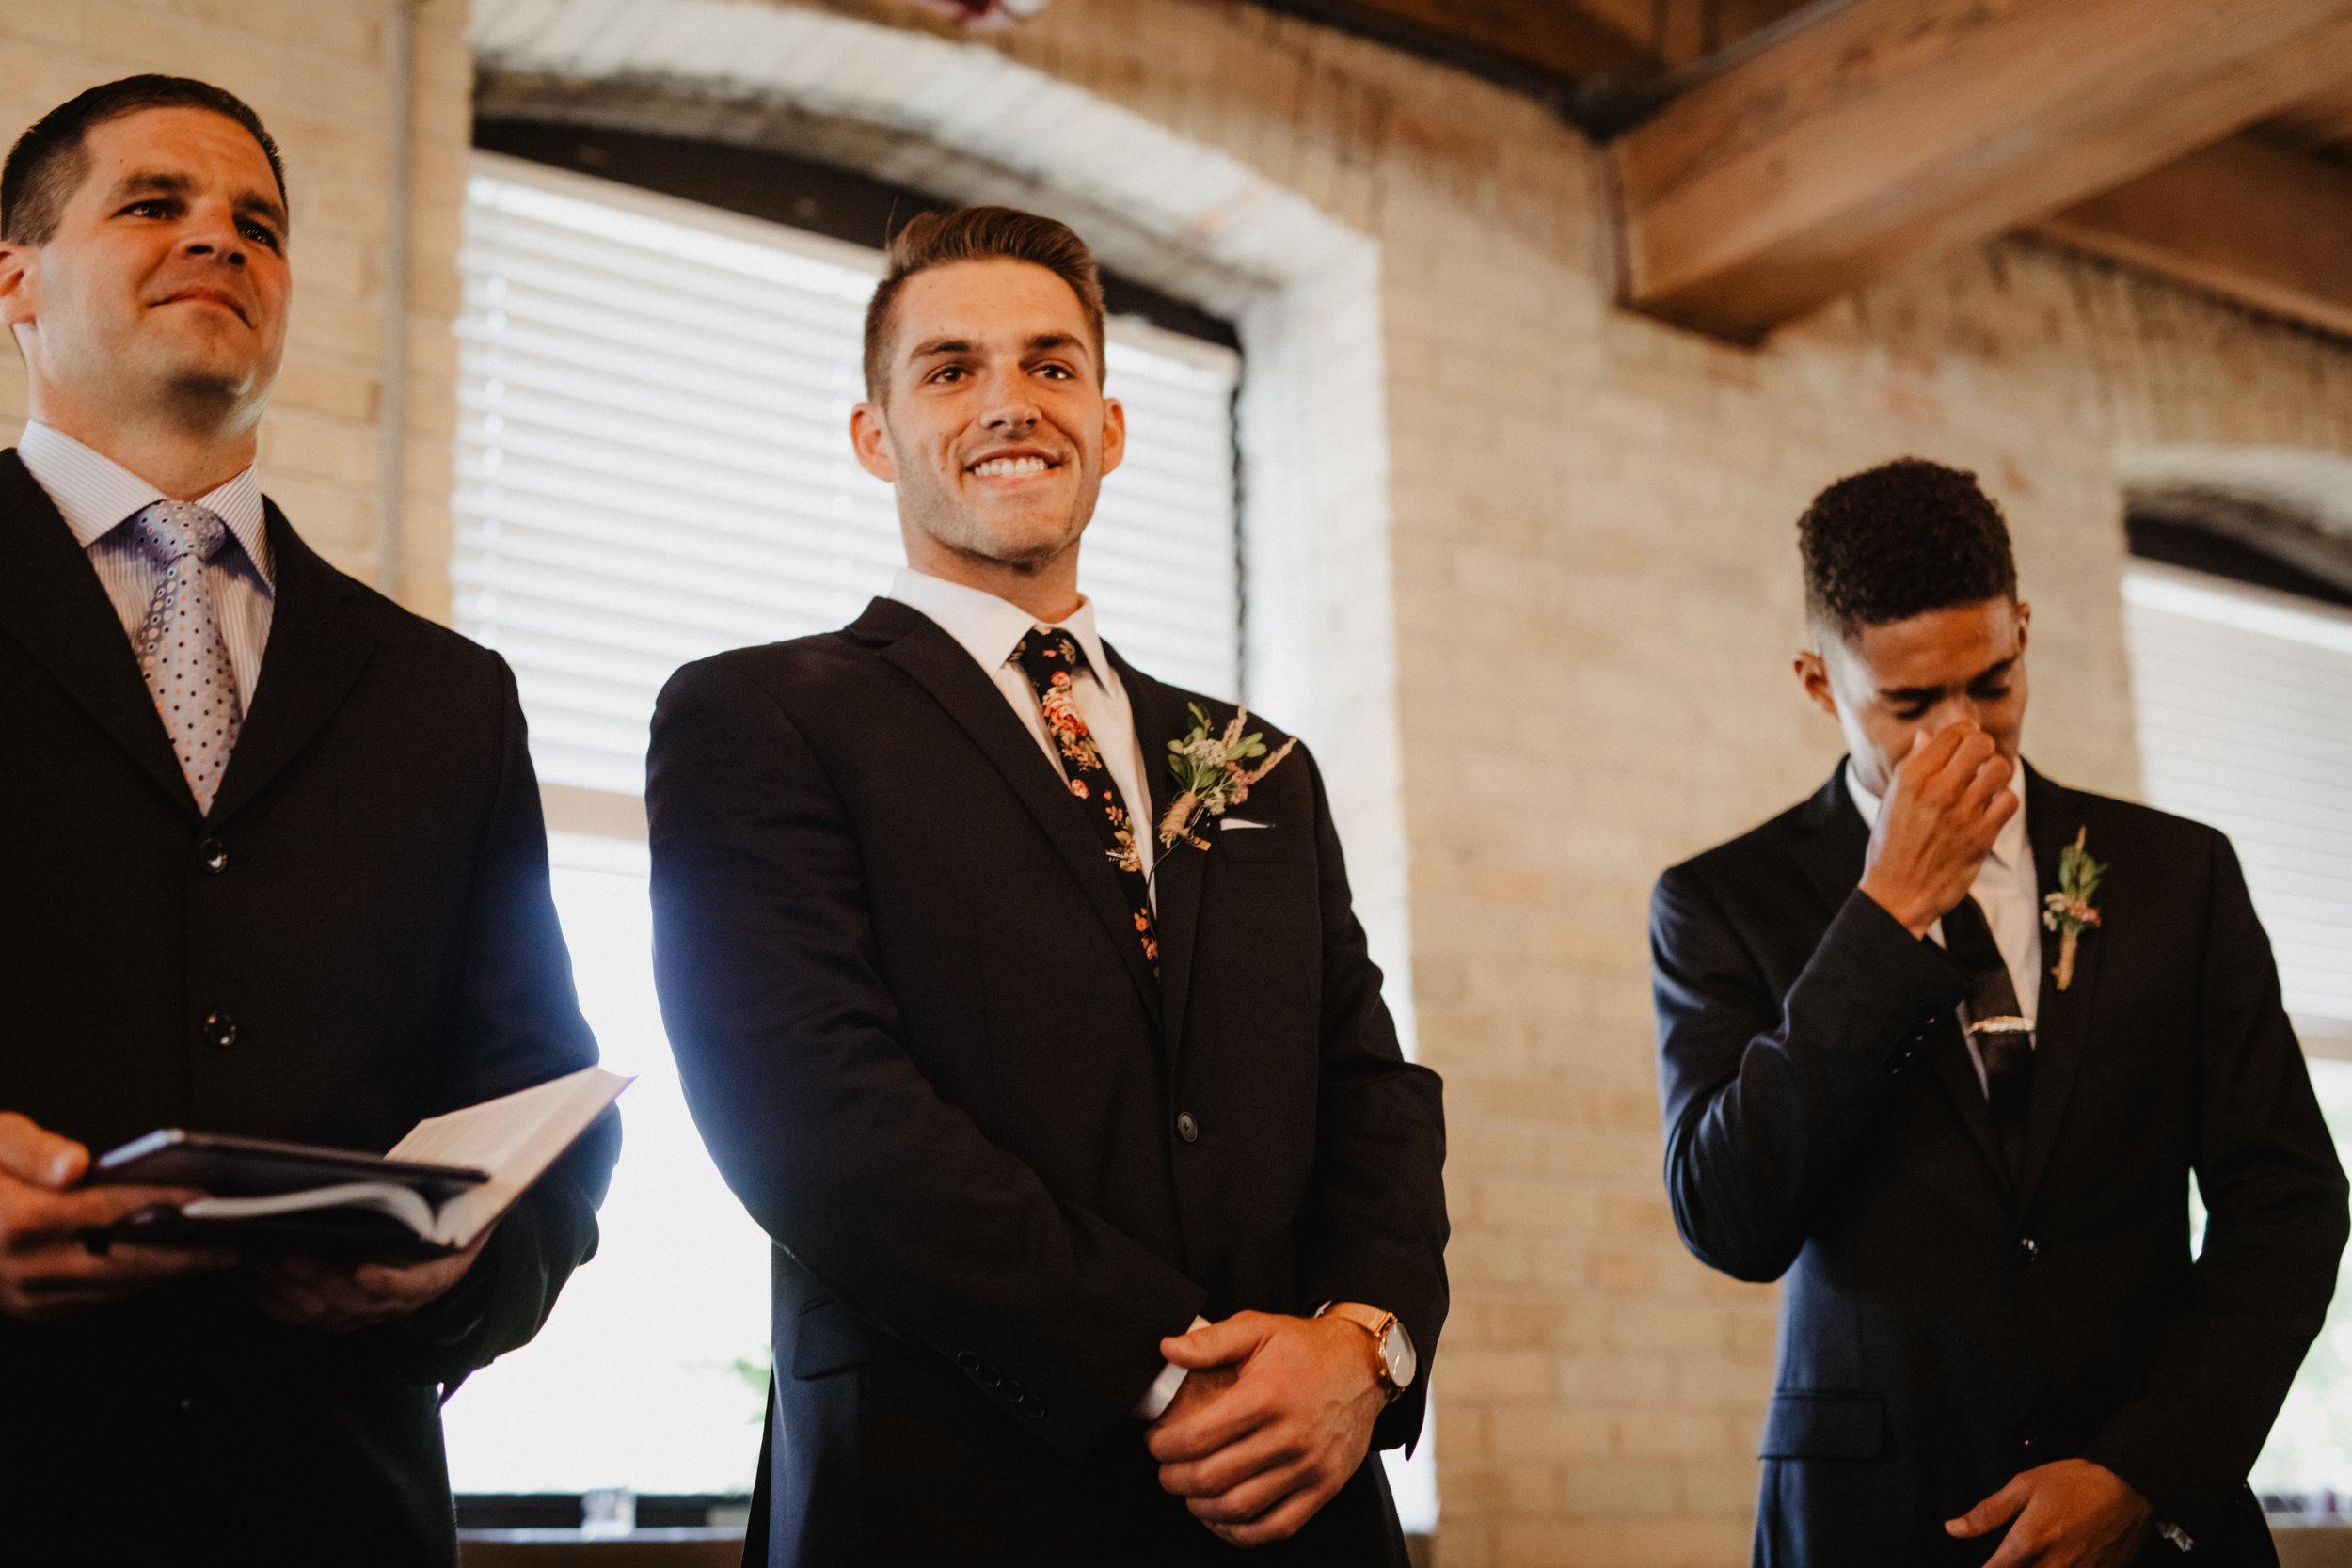 Emotional-Groomsman-Wedding-Day-01